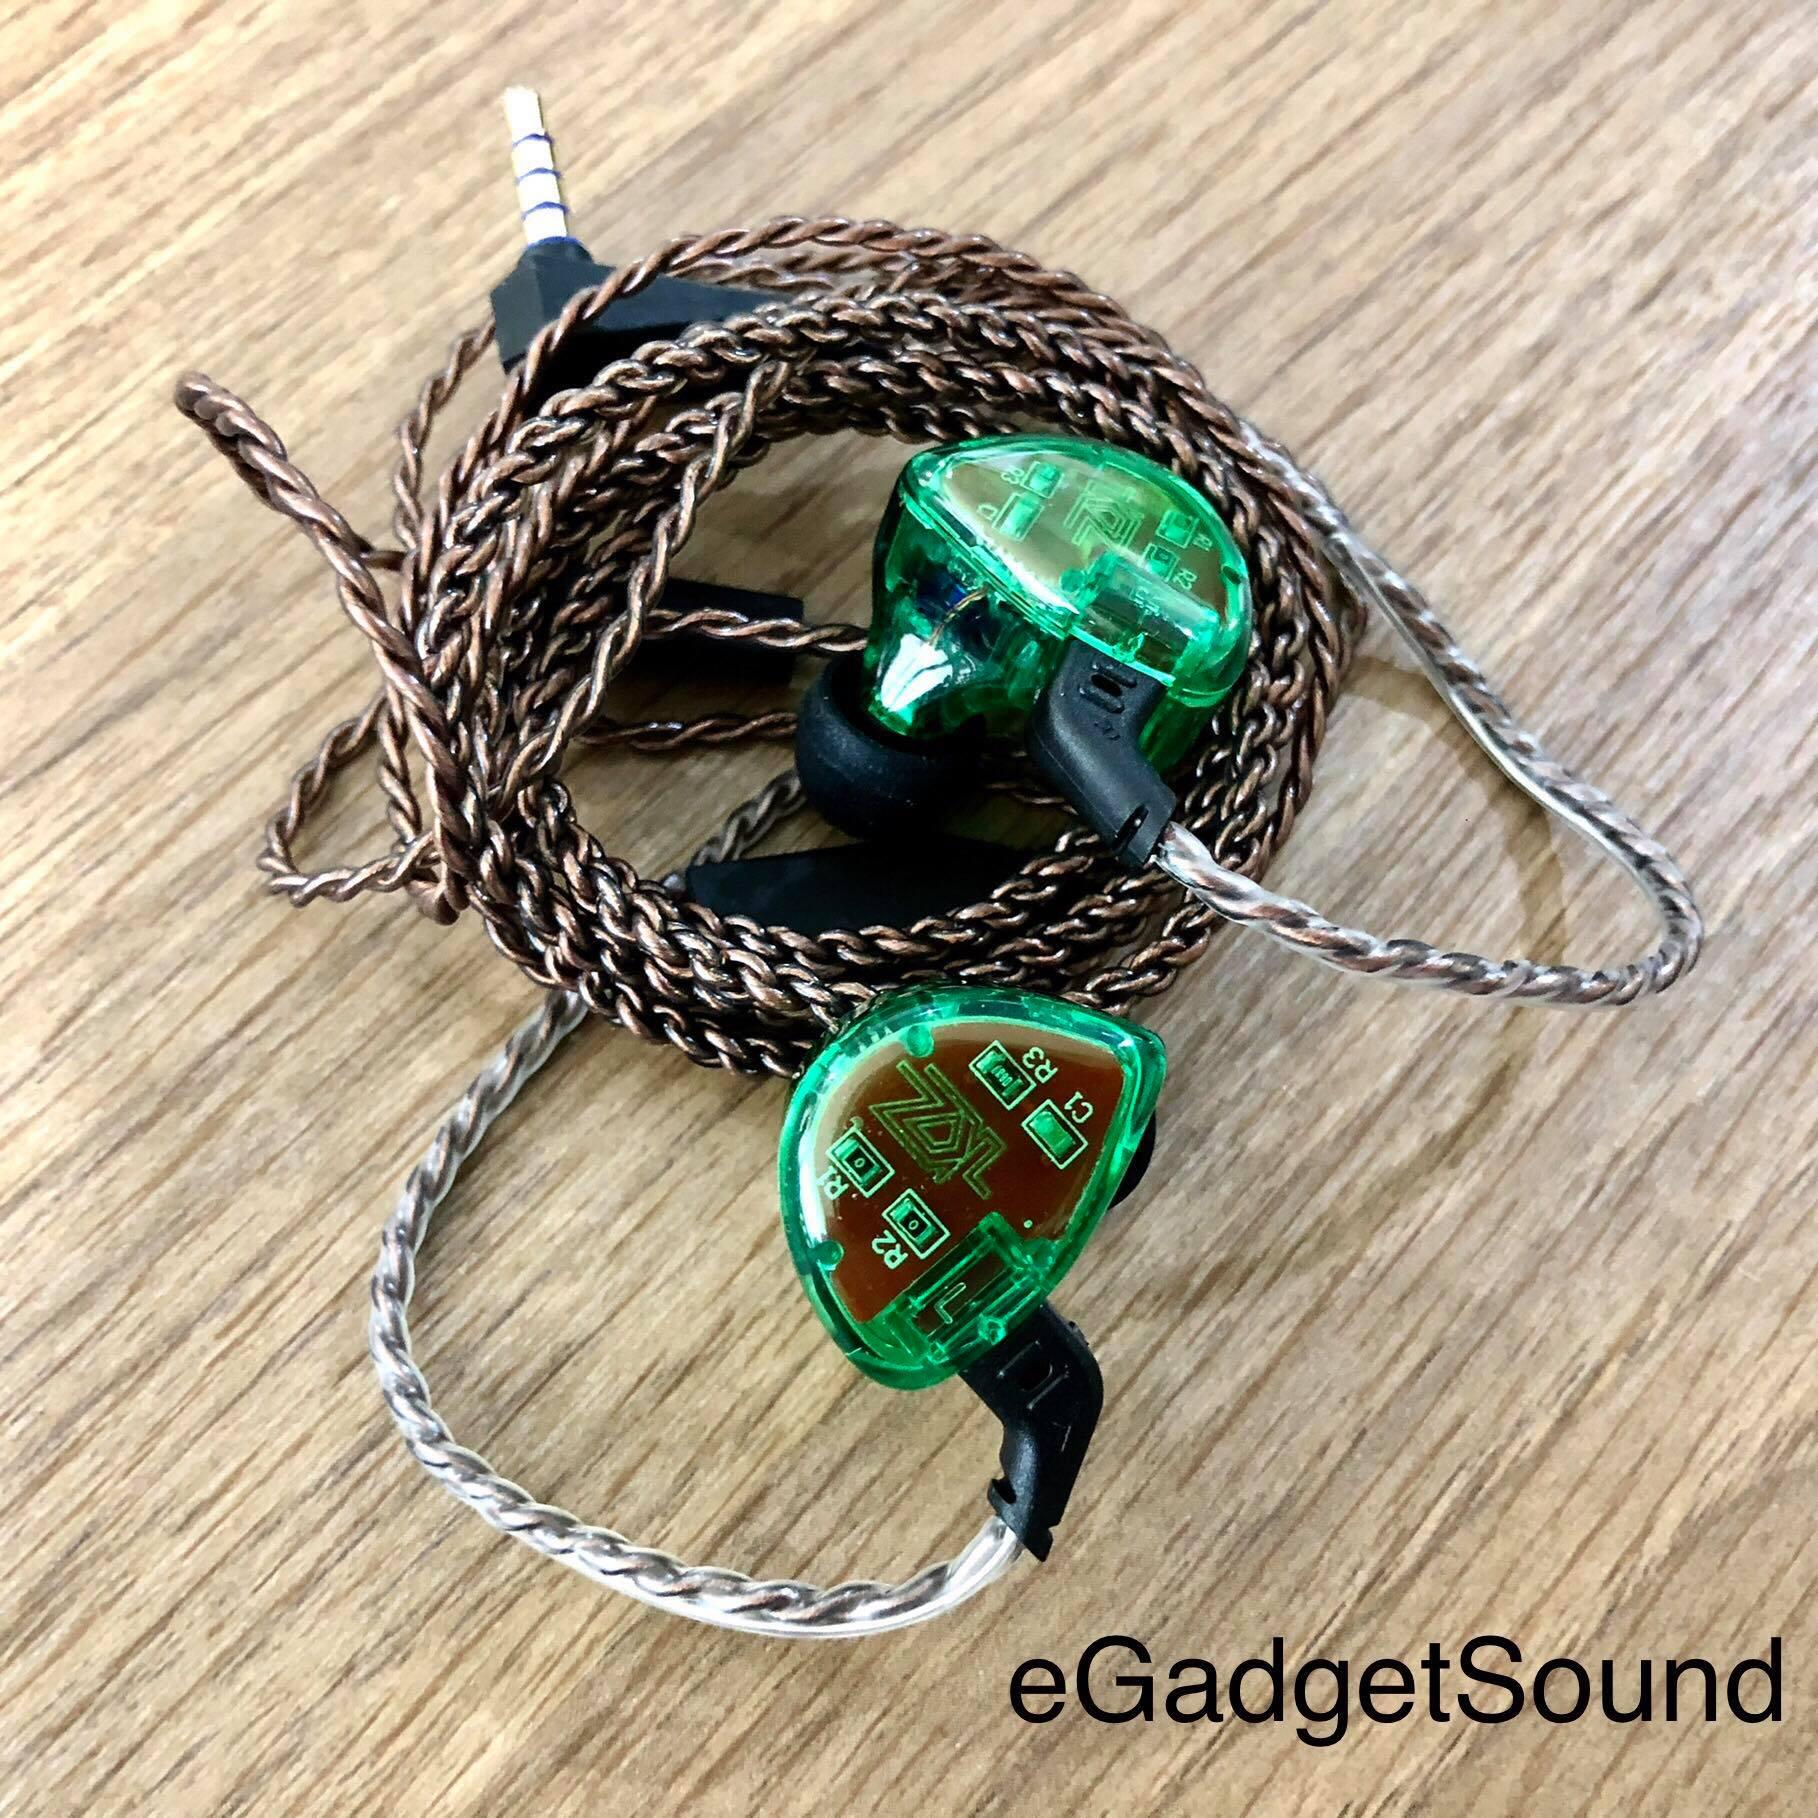 KZ หูฟังรุ่น ES4 สีเขียว (มีไมค์) หูฟัง Hybrid 1BA+1DD ไดร์เวอร์ ถอดเปลี่ยนสายได้ ประกัน 6 เดือน